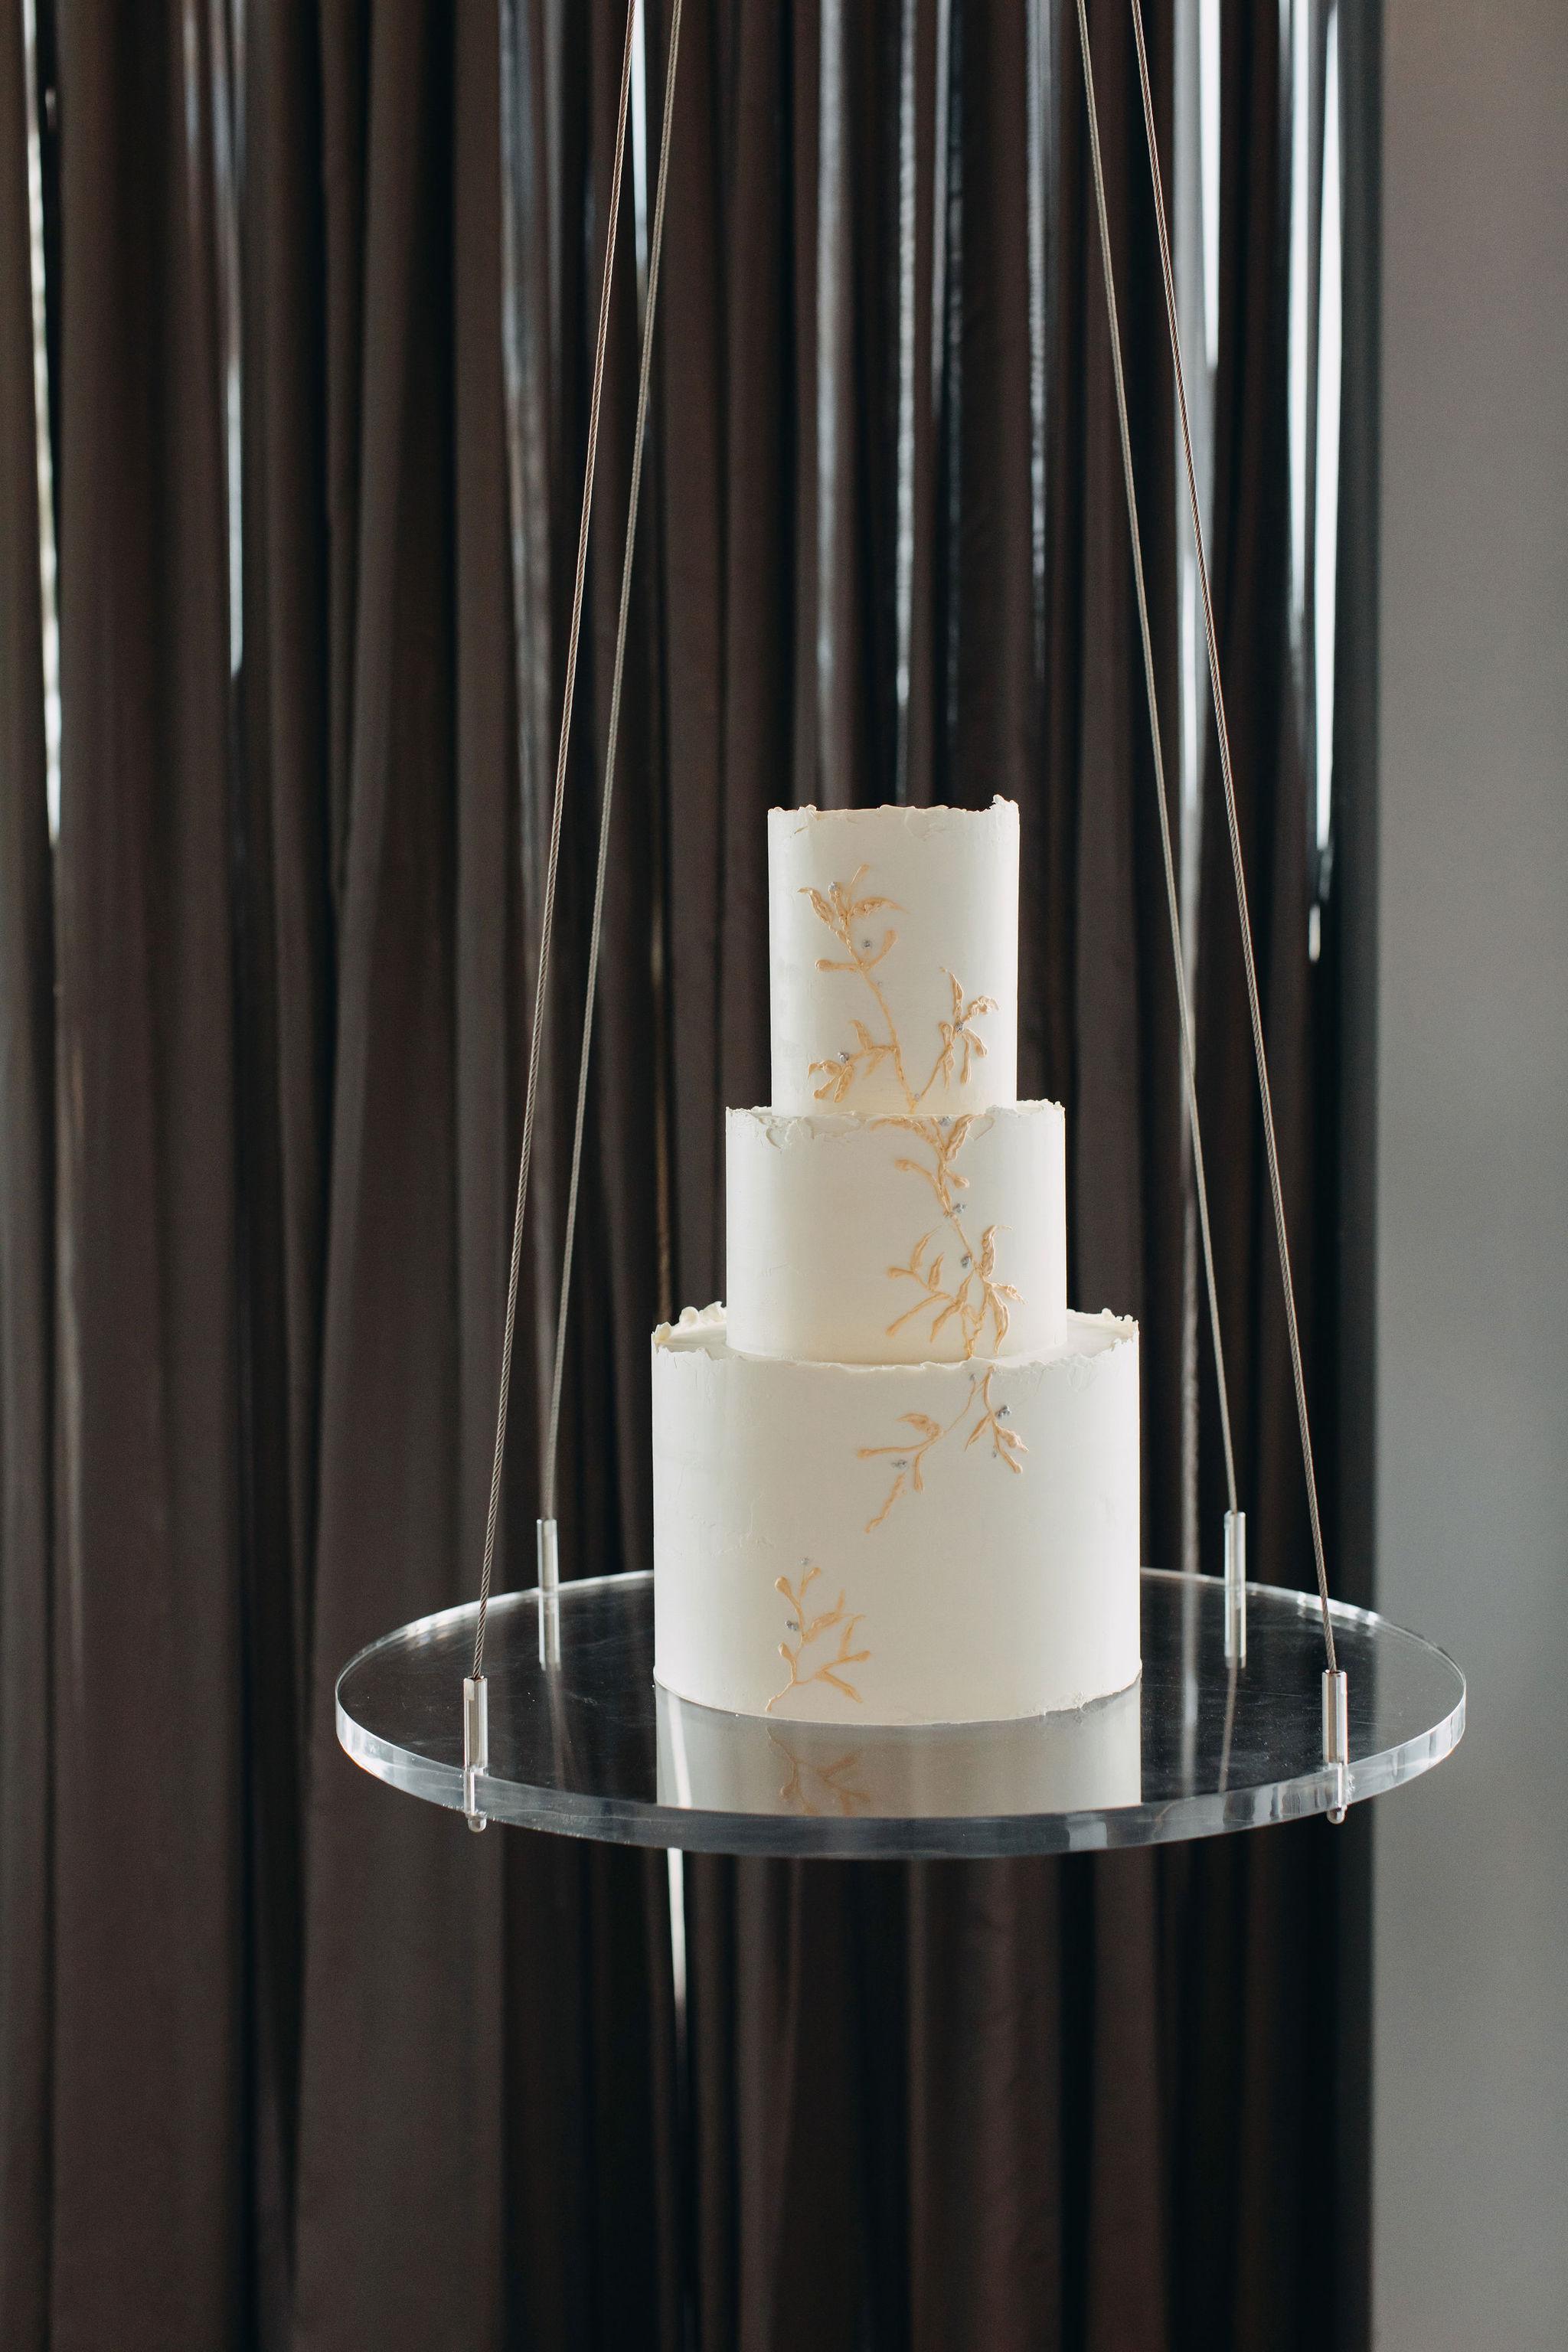 265-STATEBUILDINGS-WEDDINGOPENDAY-16FEB2020